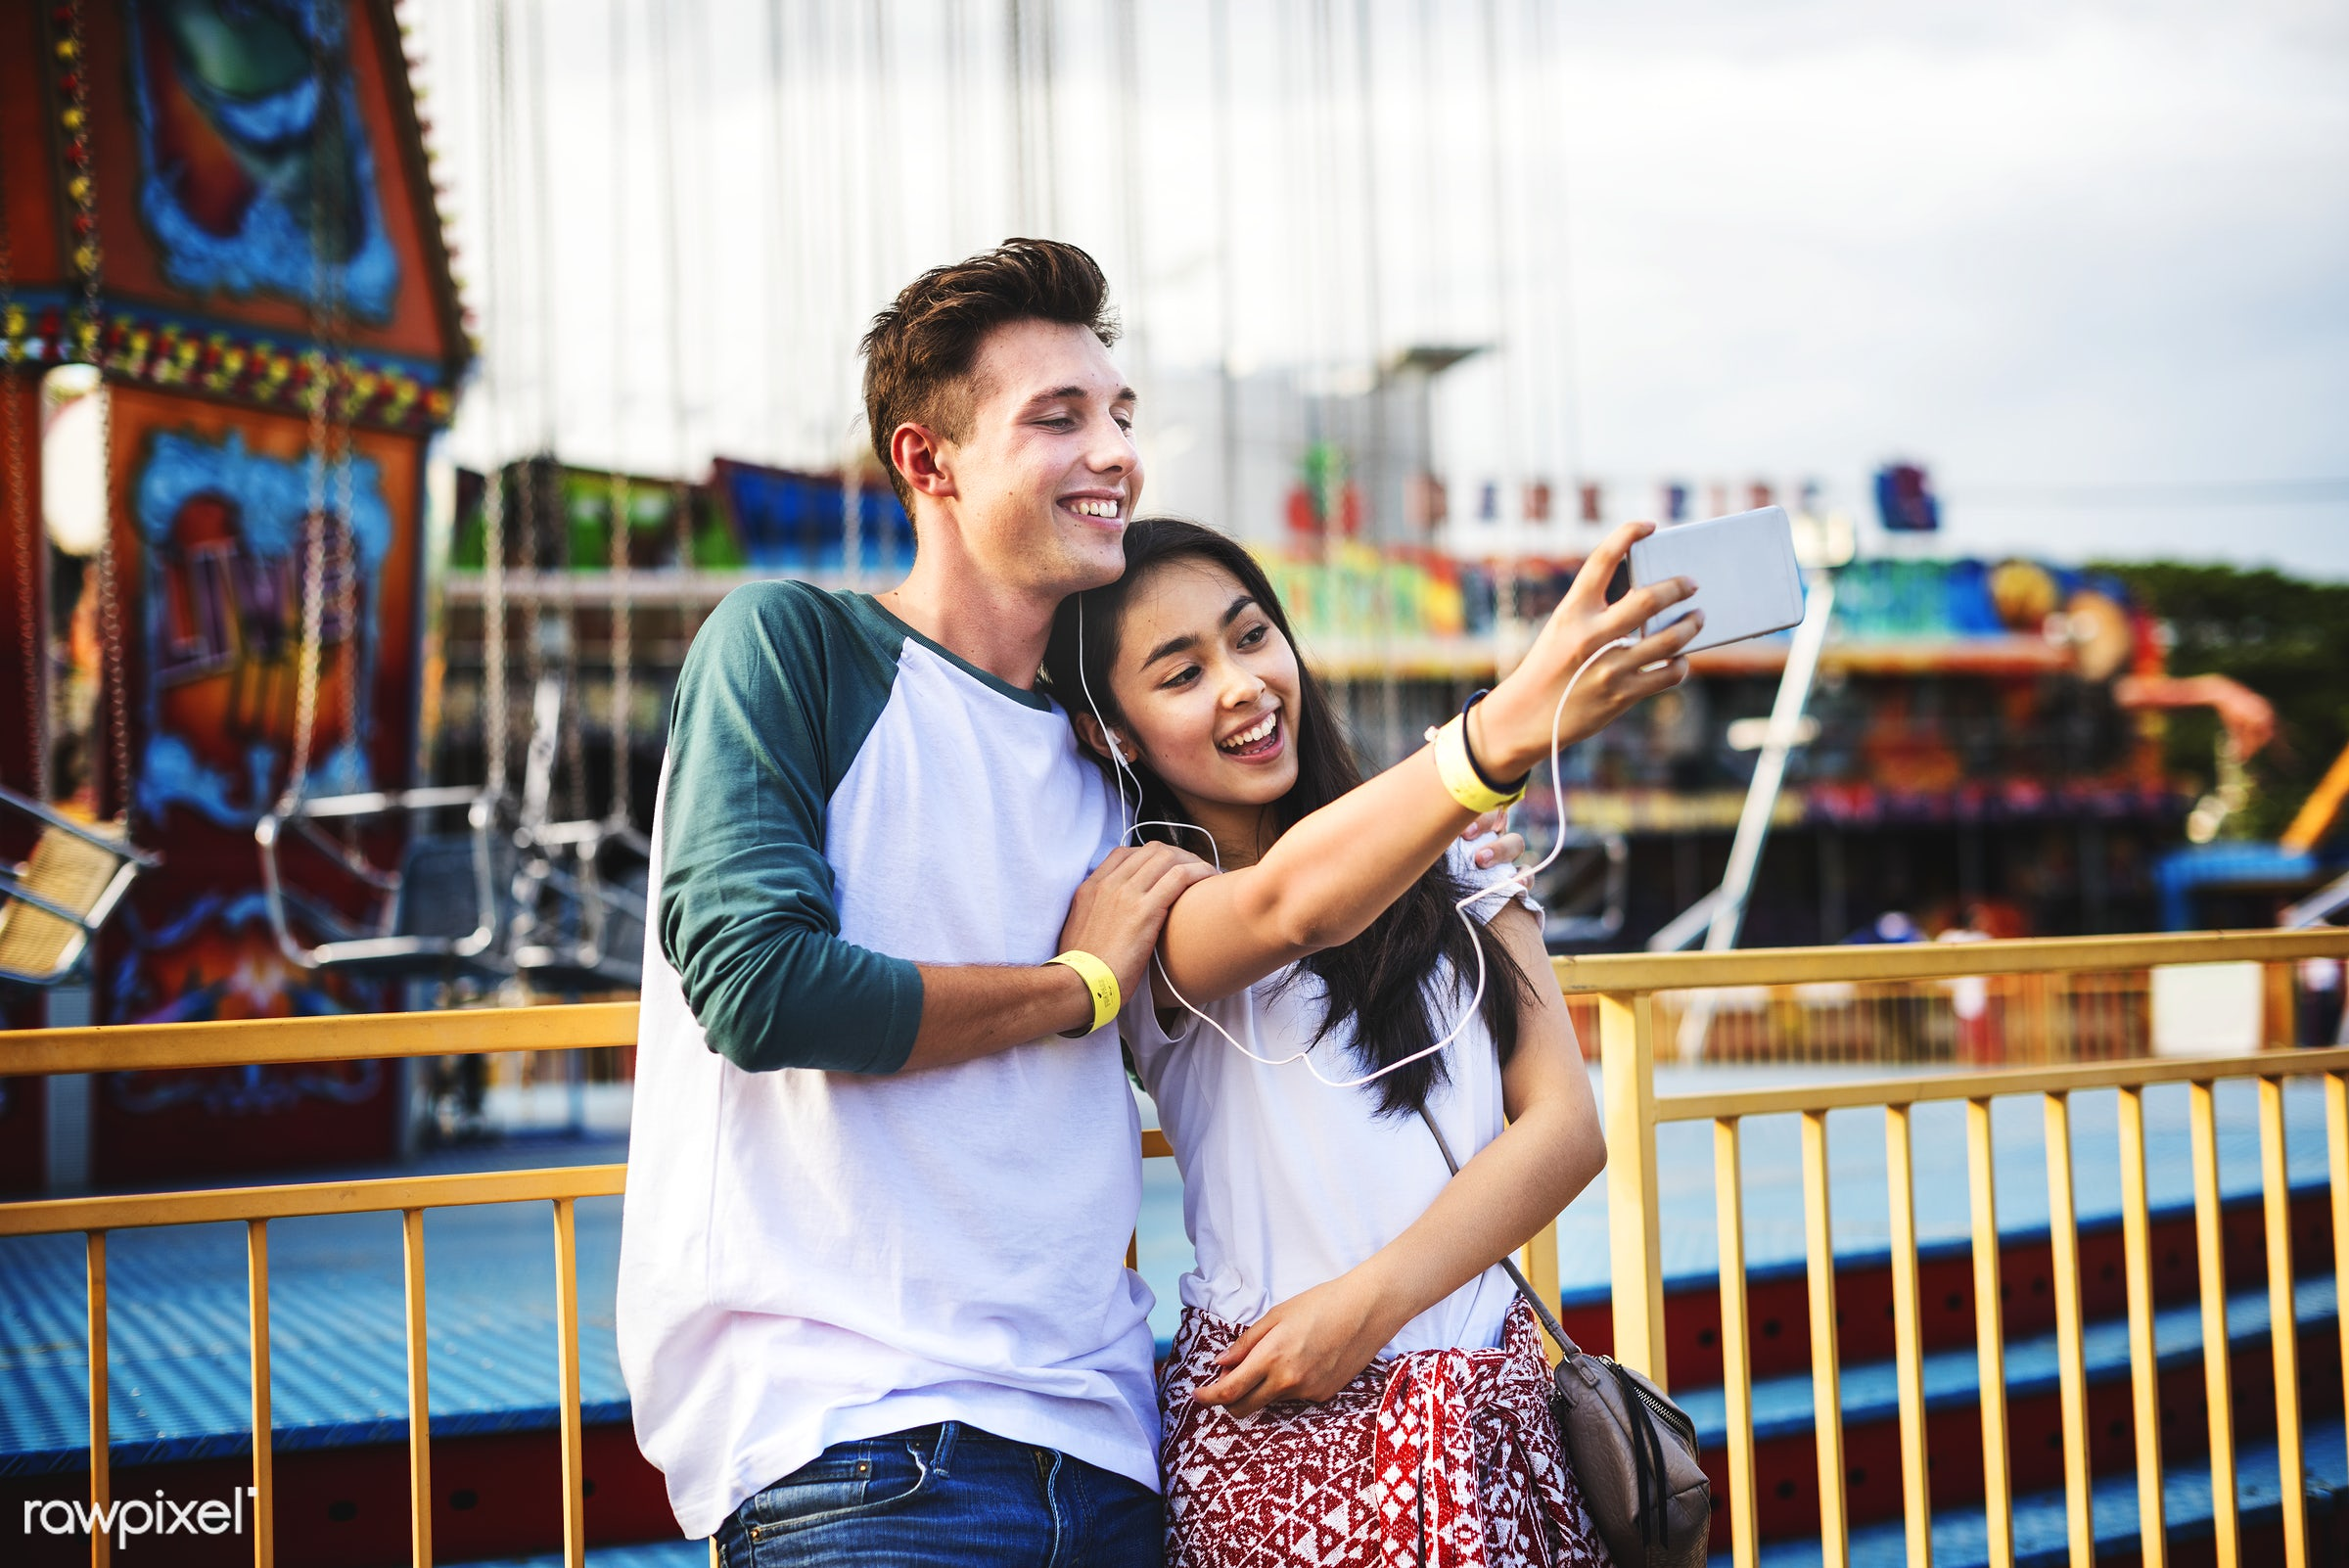 Cute couple taking a selfie at an amusement park - amusement park, selfie, activity, american, asian, black hair, carefree,...